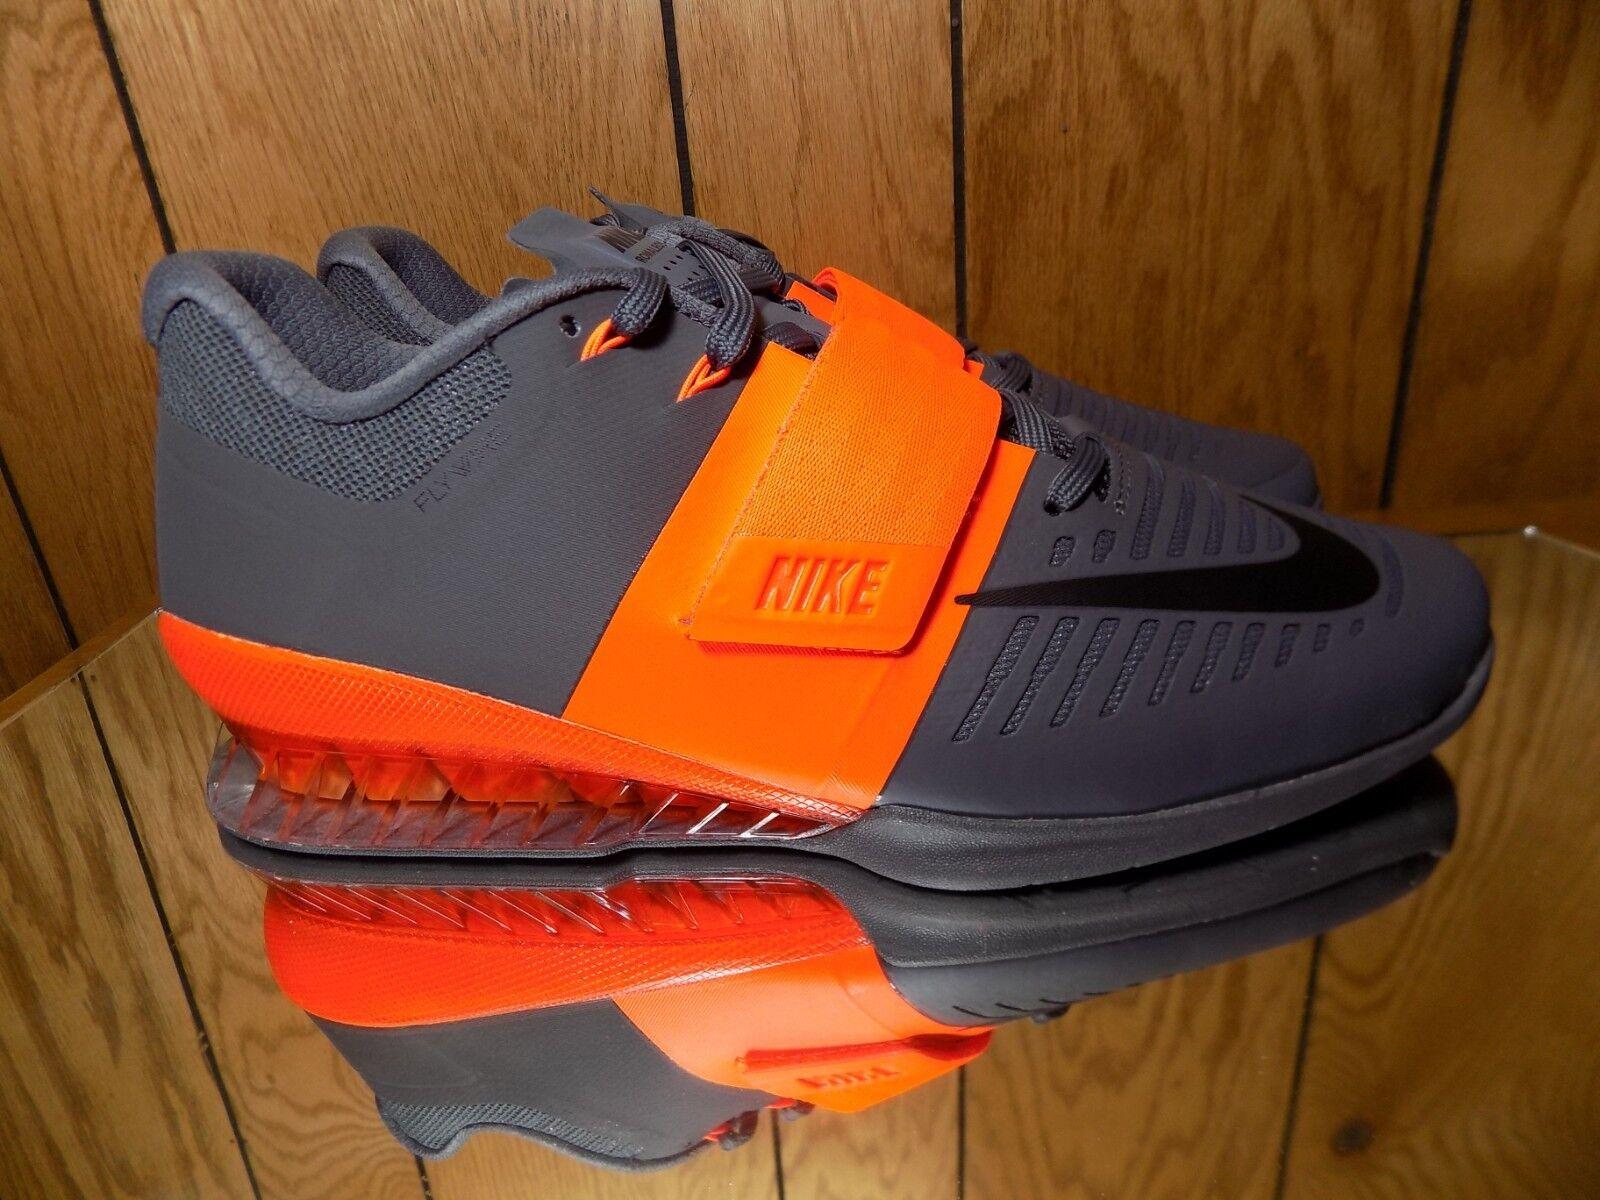 Nike Men's Romaleo's 3 Weightlifting shoes Hyper Crimson Grey 852933-800 Size 12